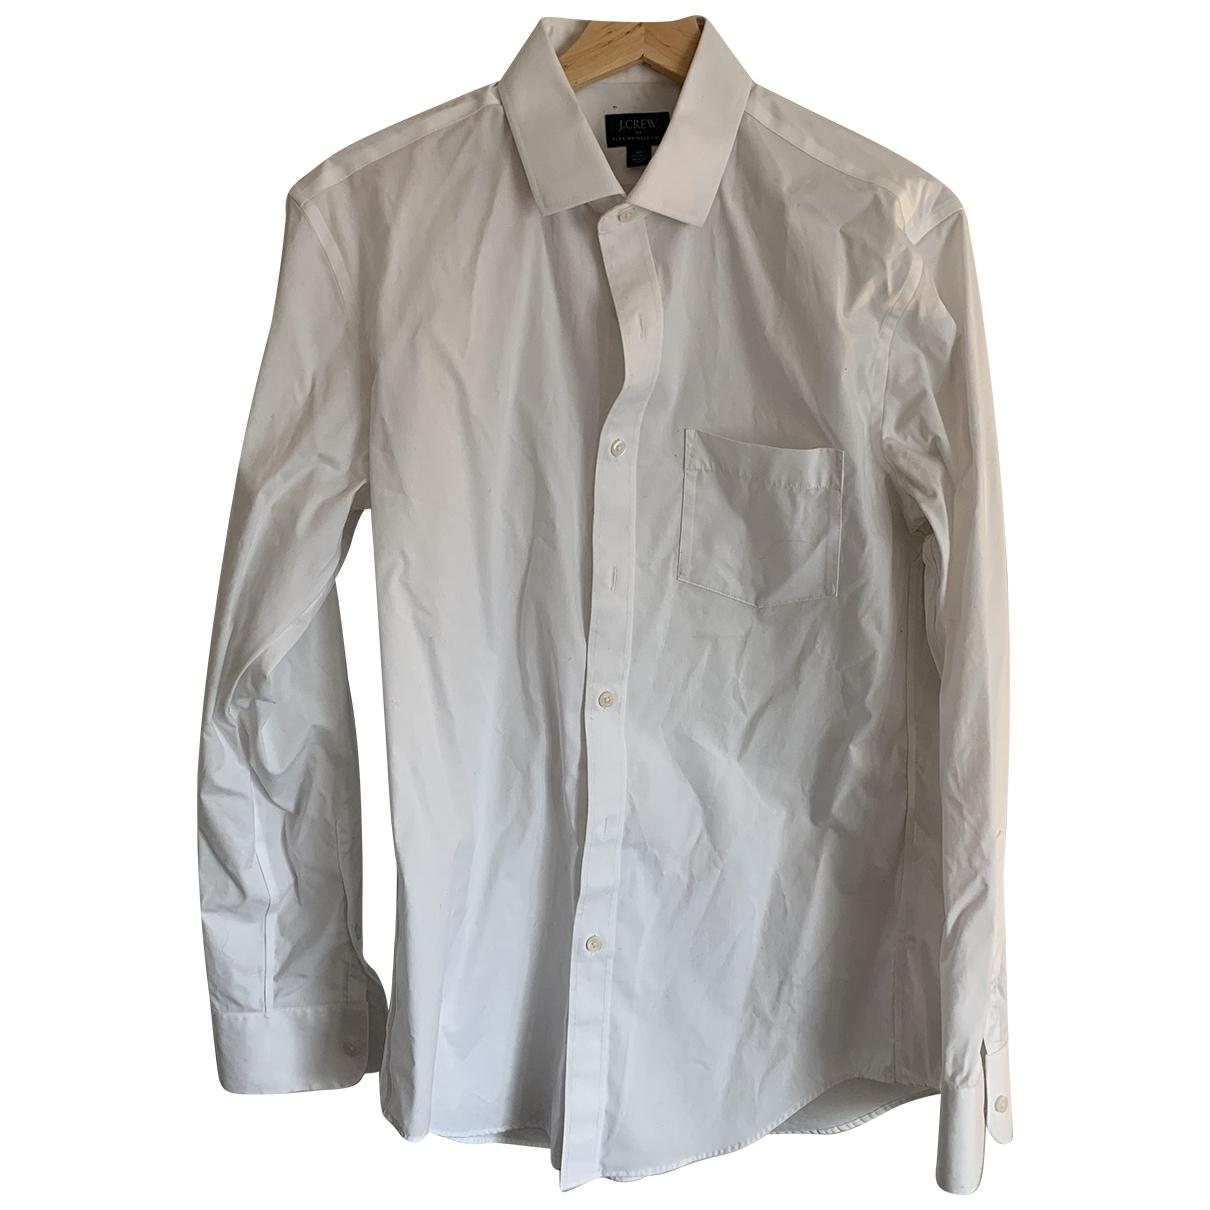 J.crew \N White Cotton Shirts for Men M International